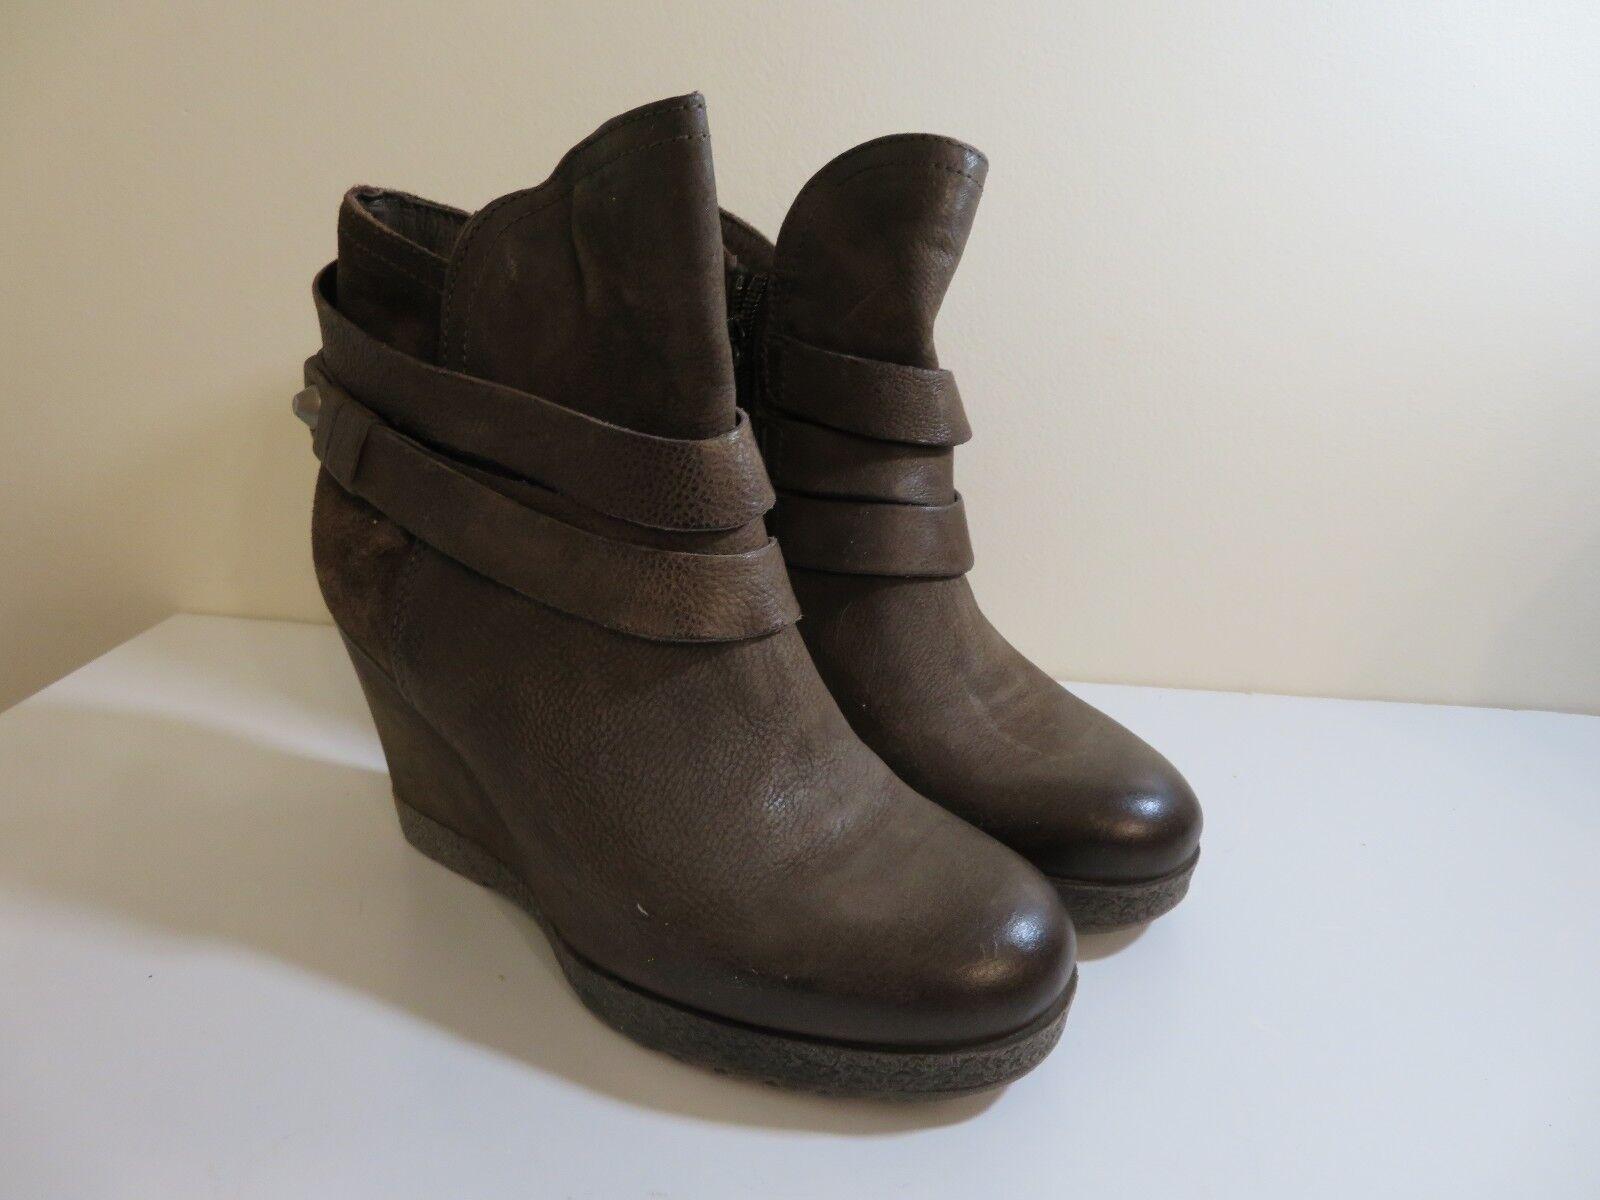 Miz Mooz Leder Wedge Ankle Stiefel Narcissa CHOCOLATE 36 FITS 5 1/2 TO 6